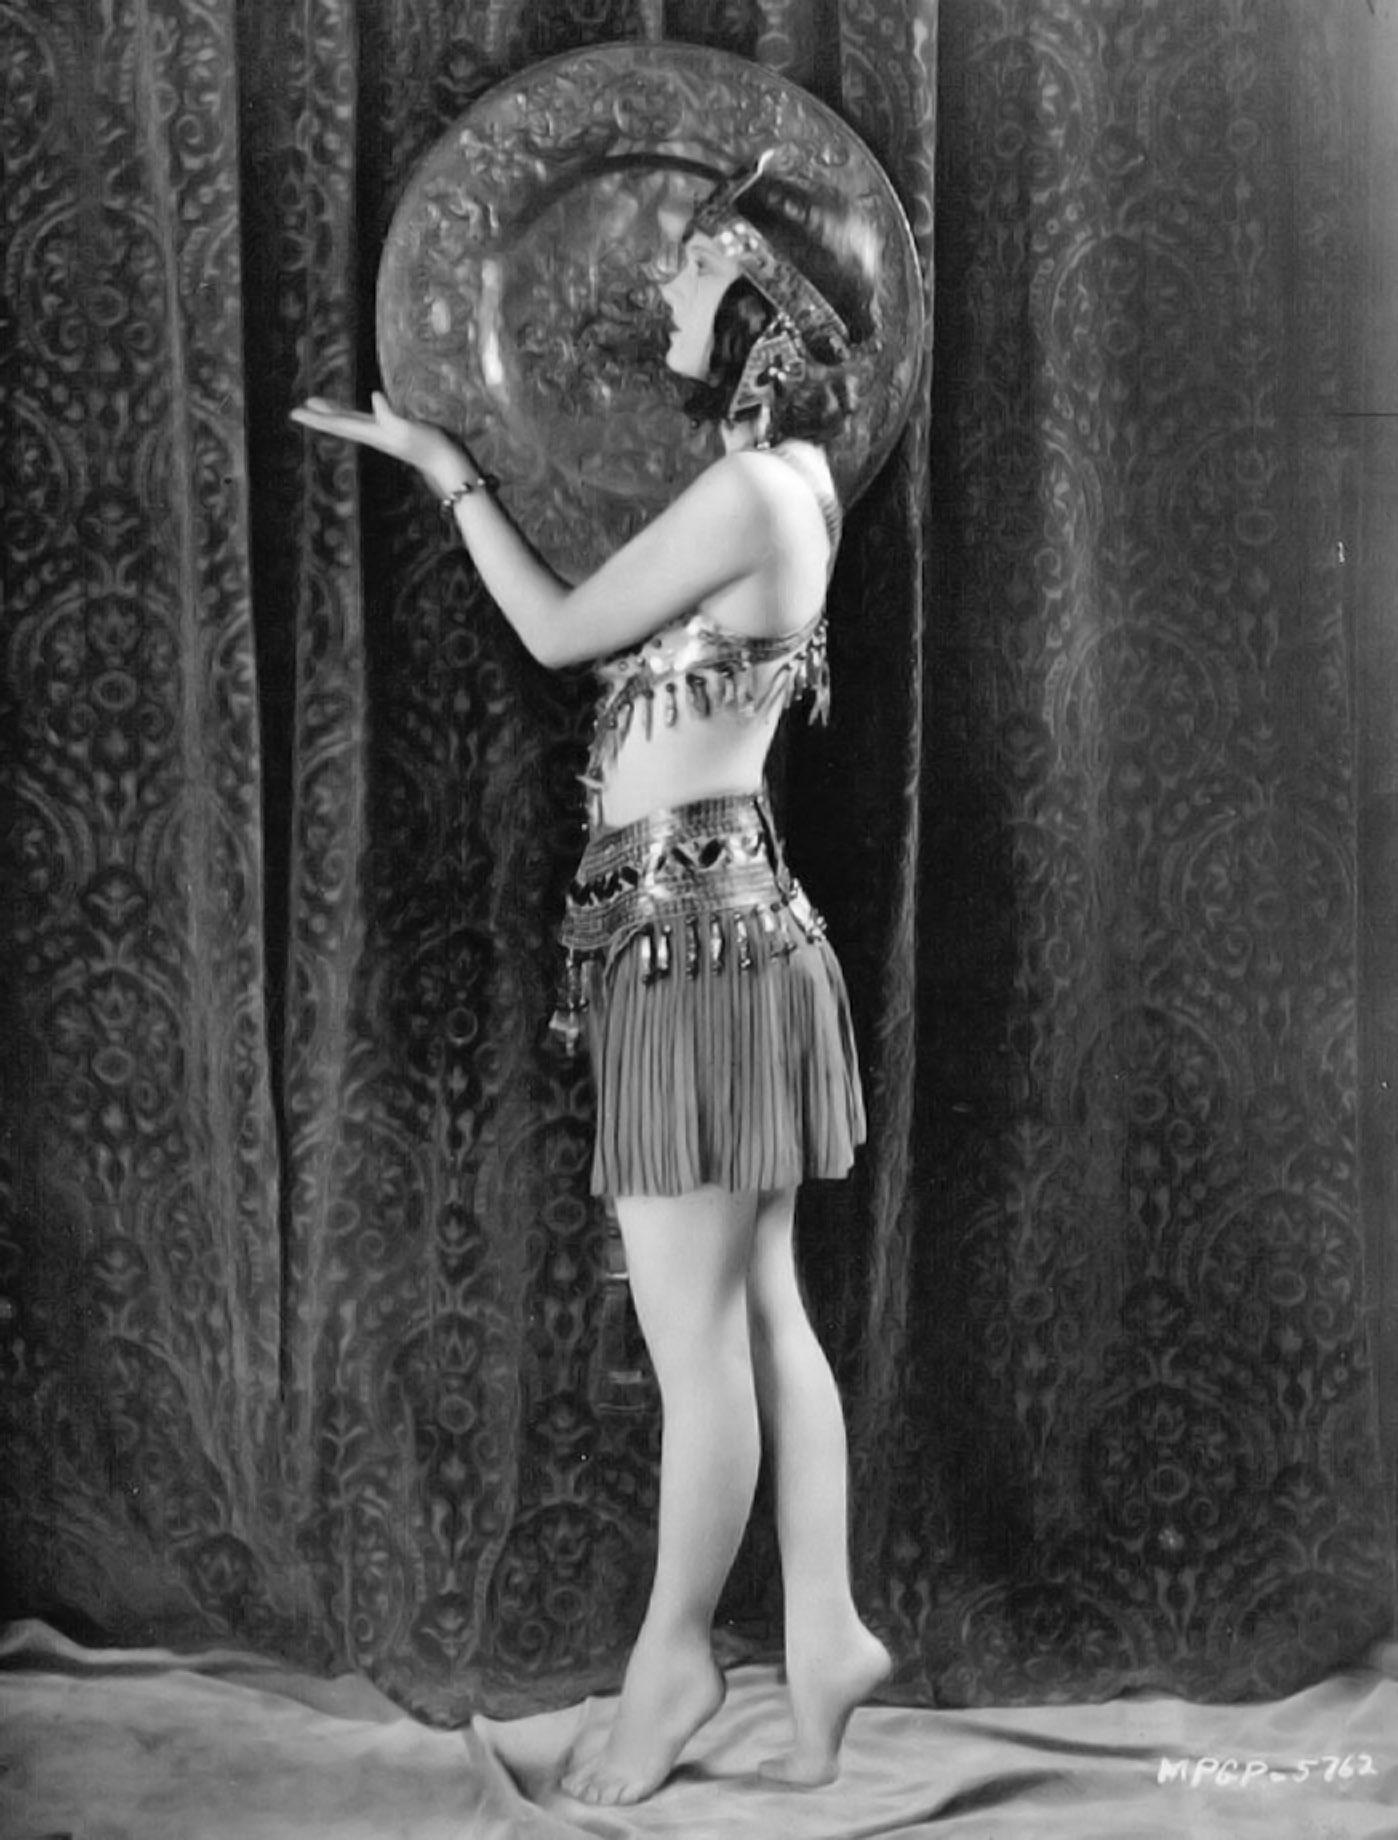 Betty Arlen